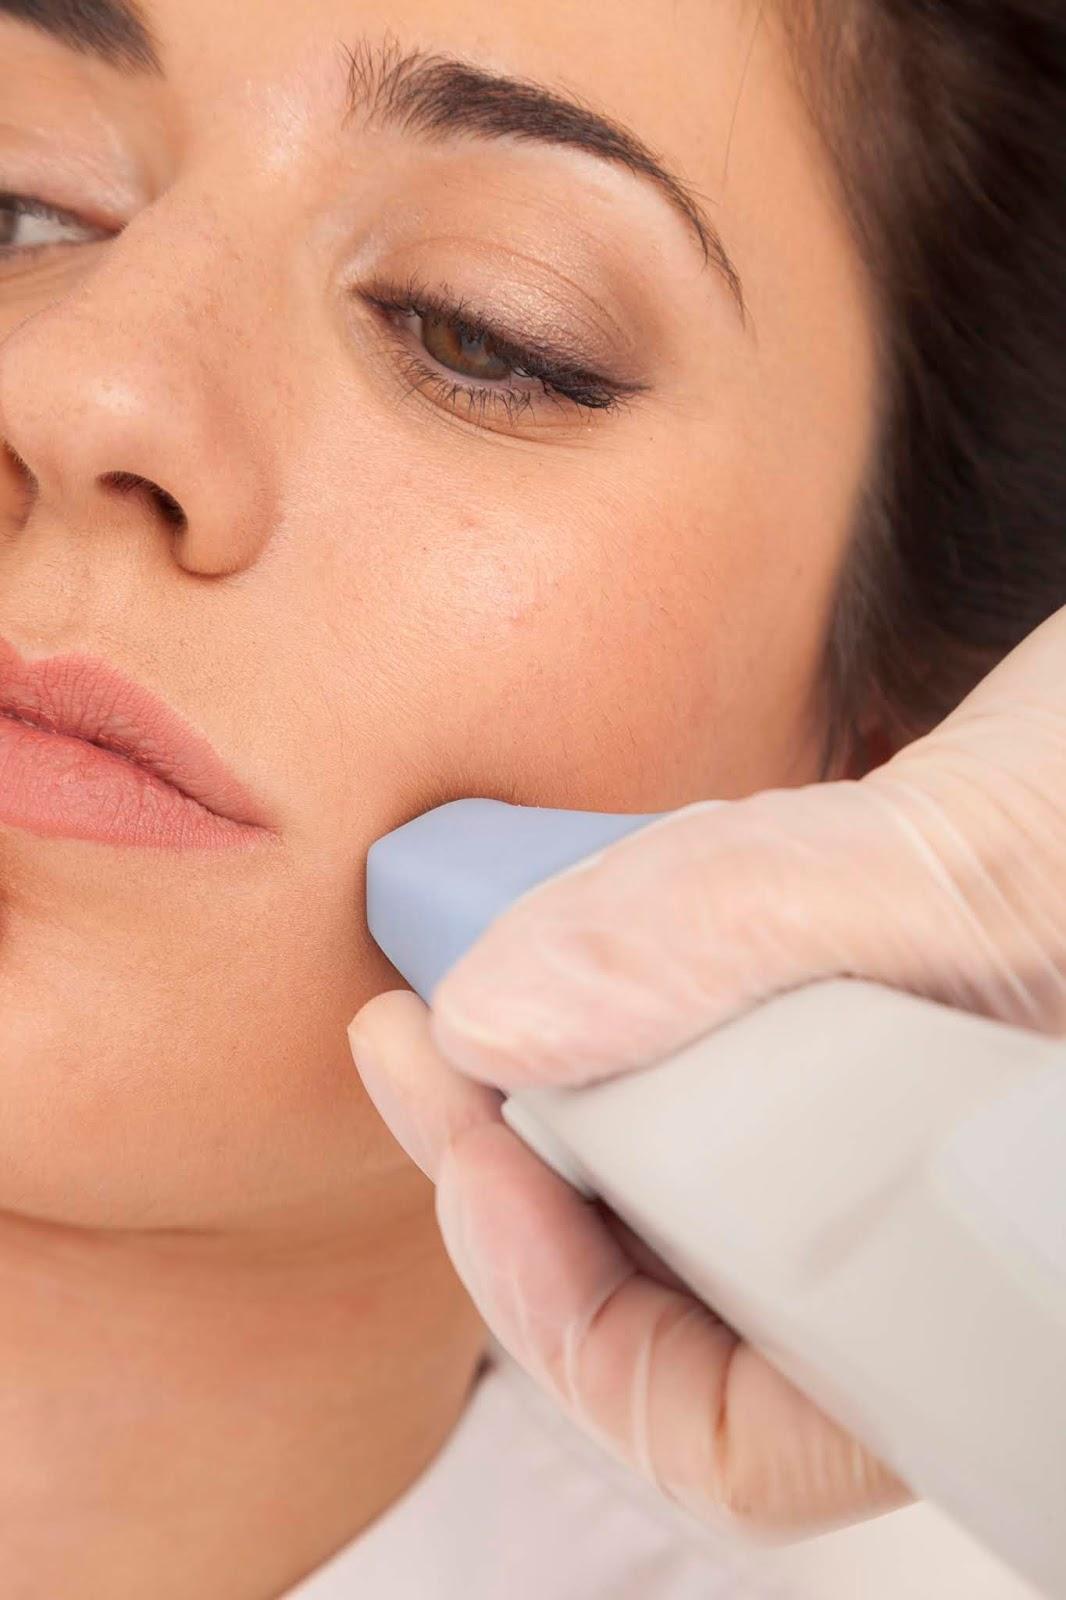 Tratamiento facial en medicina estética ERES